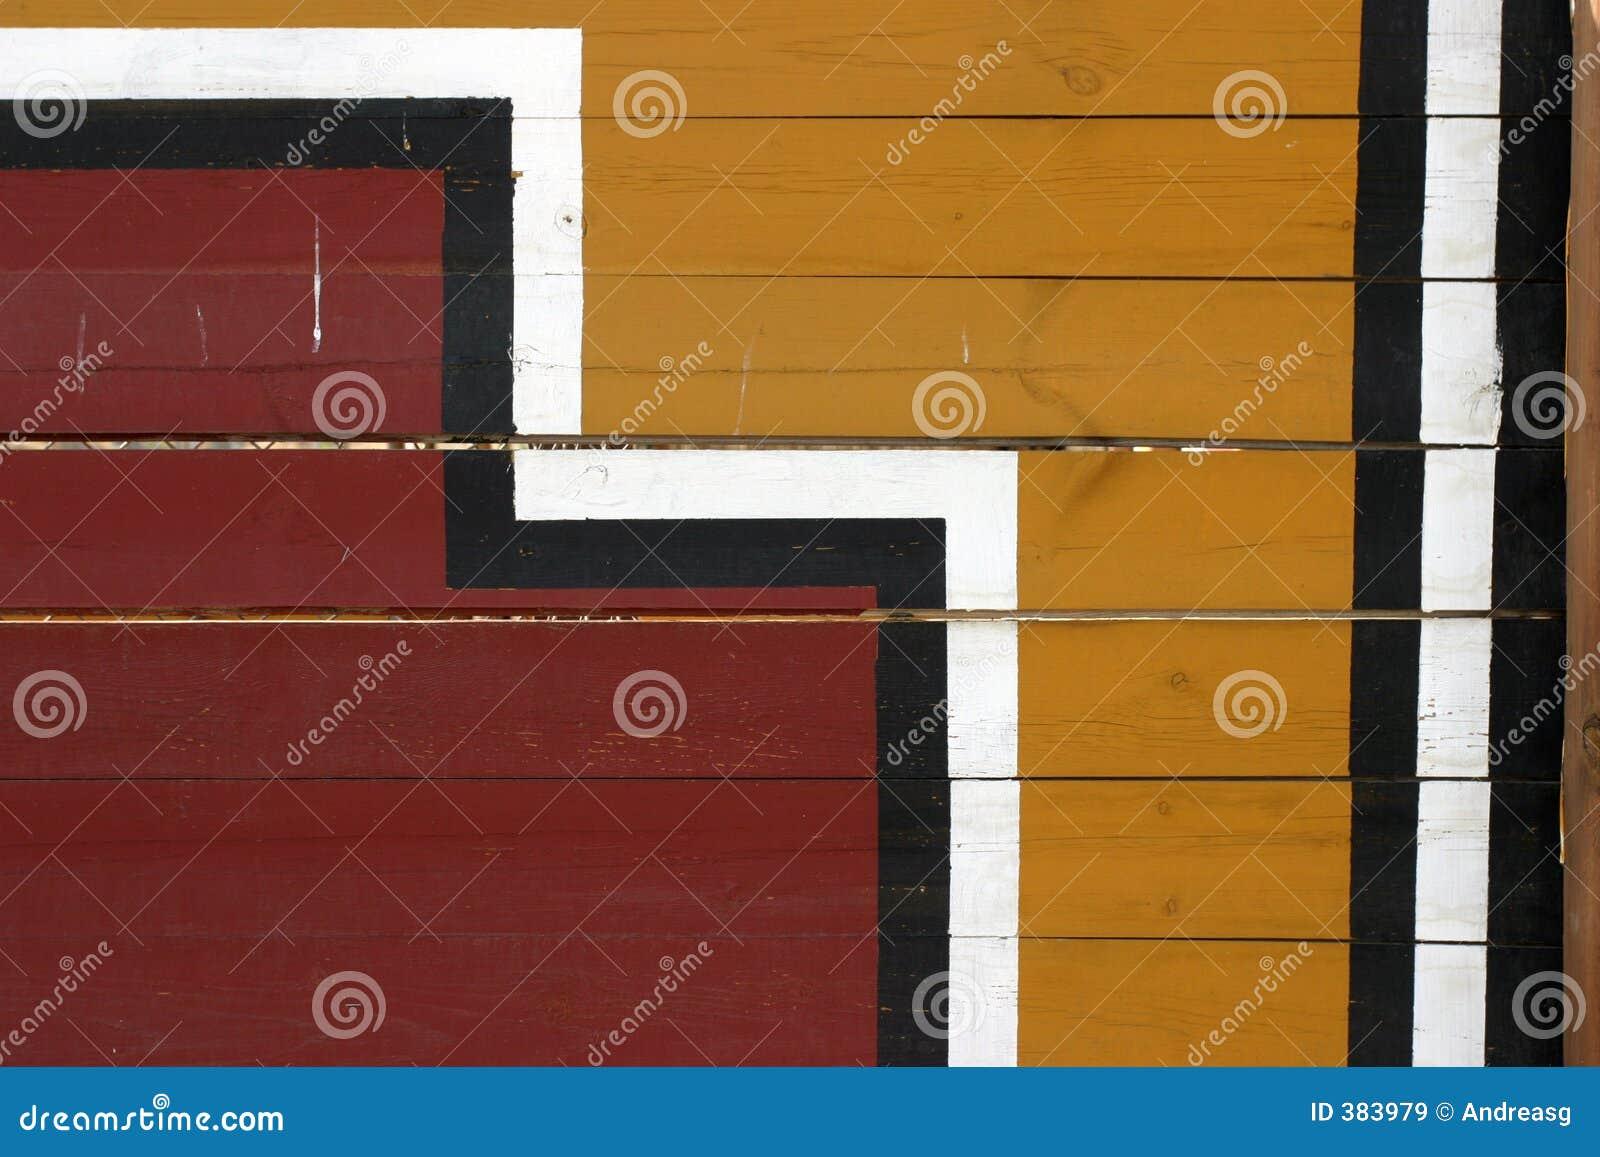 Pittura geometrica sulle plance